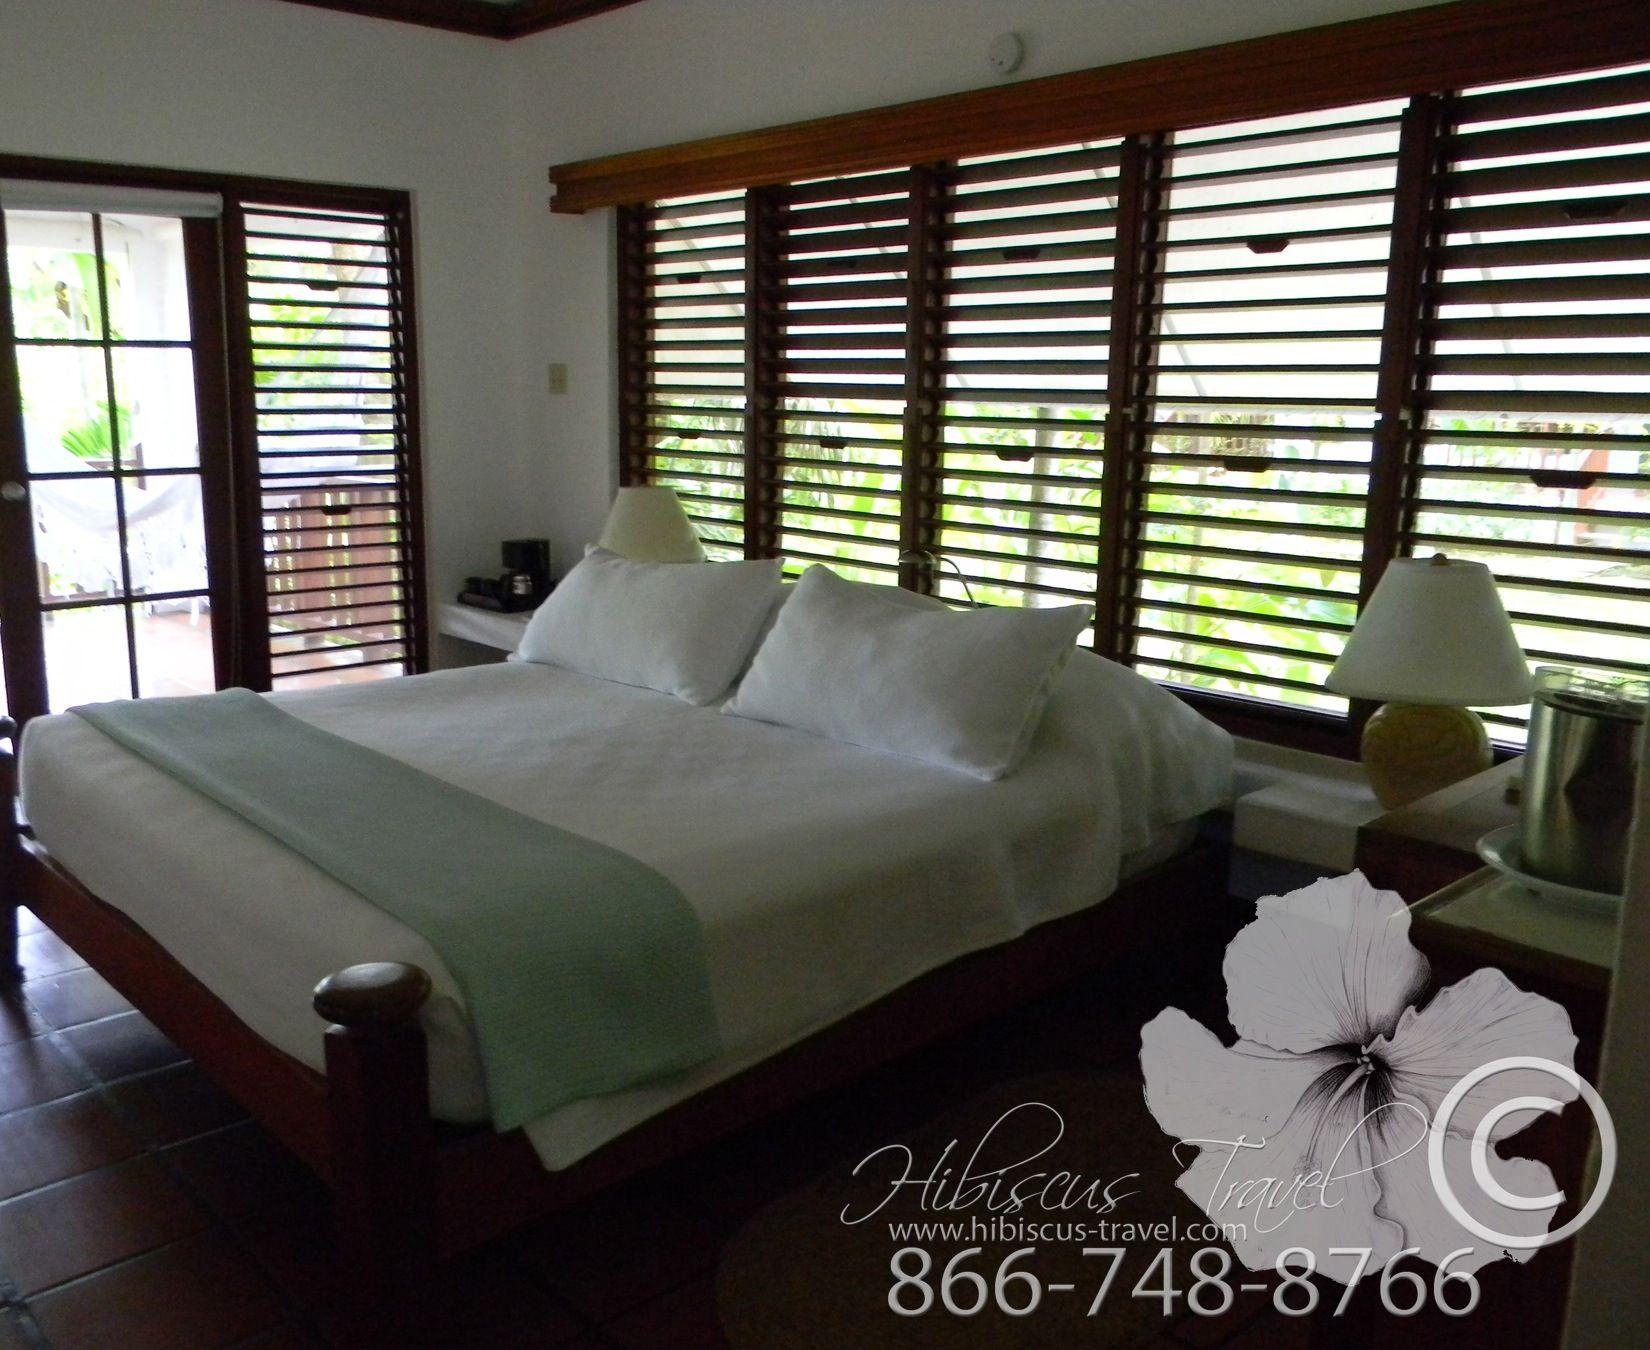 Atrium Suite Www Hibiscus Travel Com Couples Swept Away Home Decor Suite